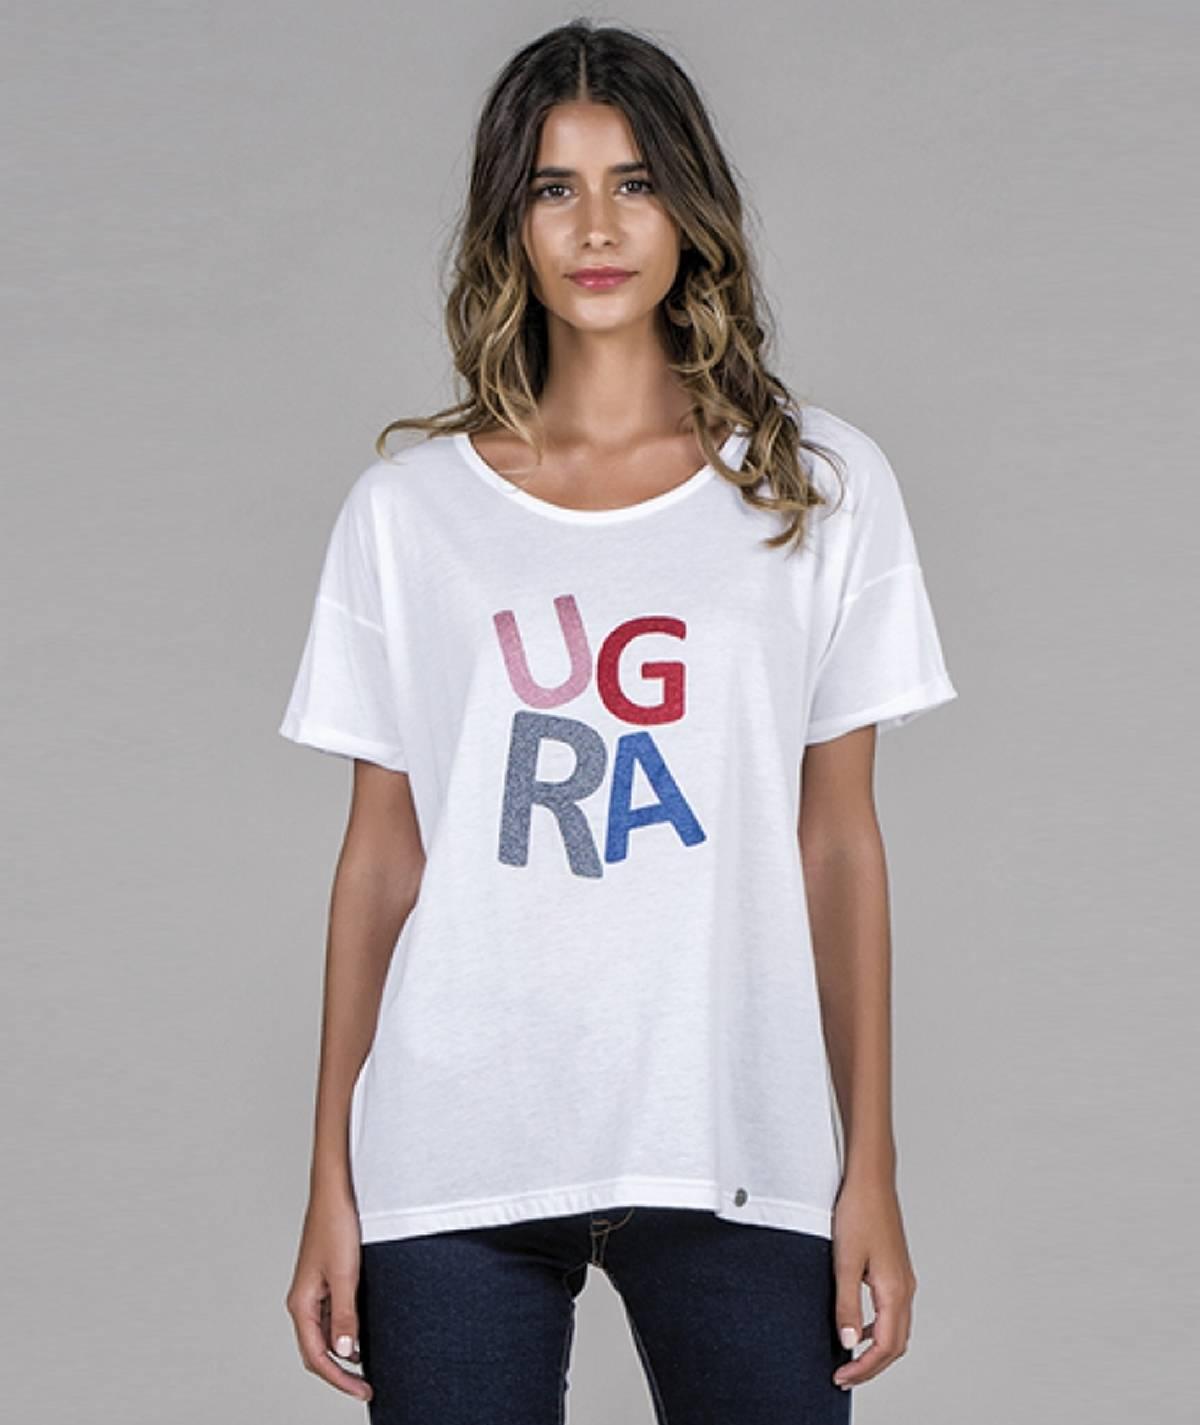 T-shirt estampado  RÜGA